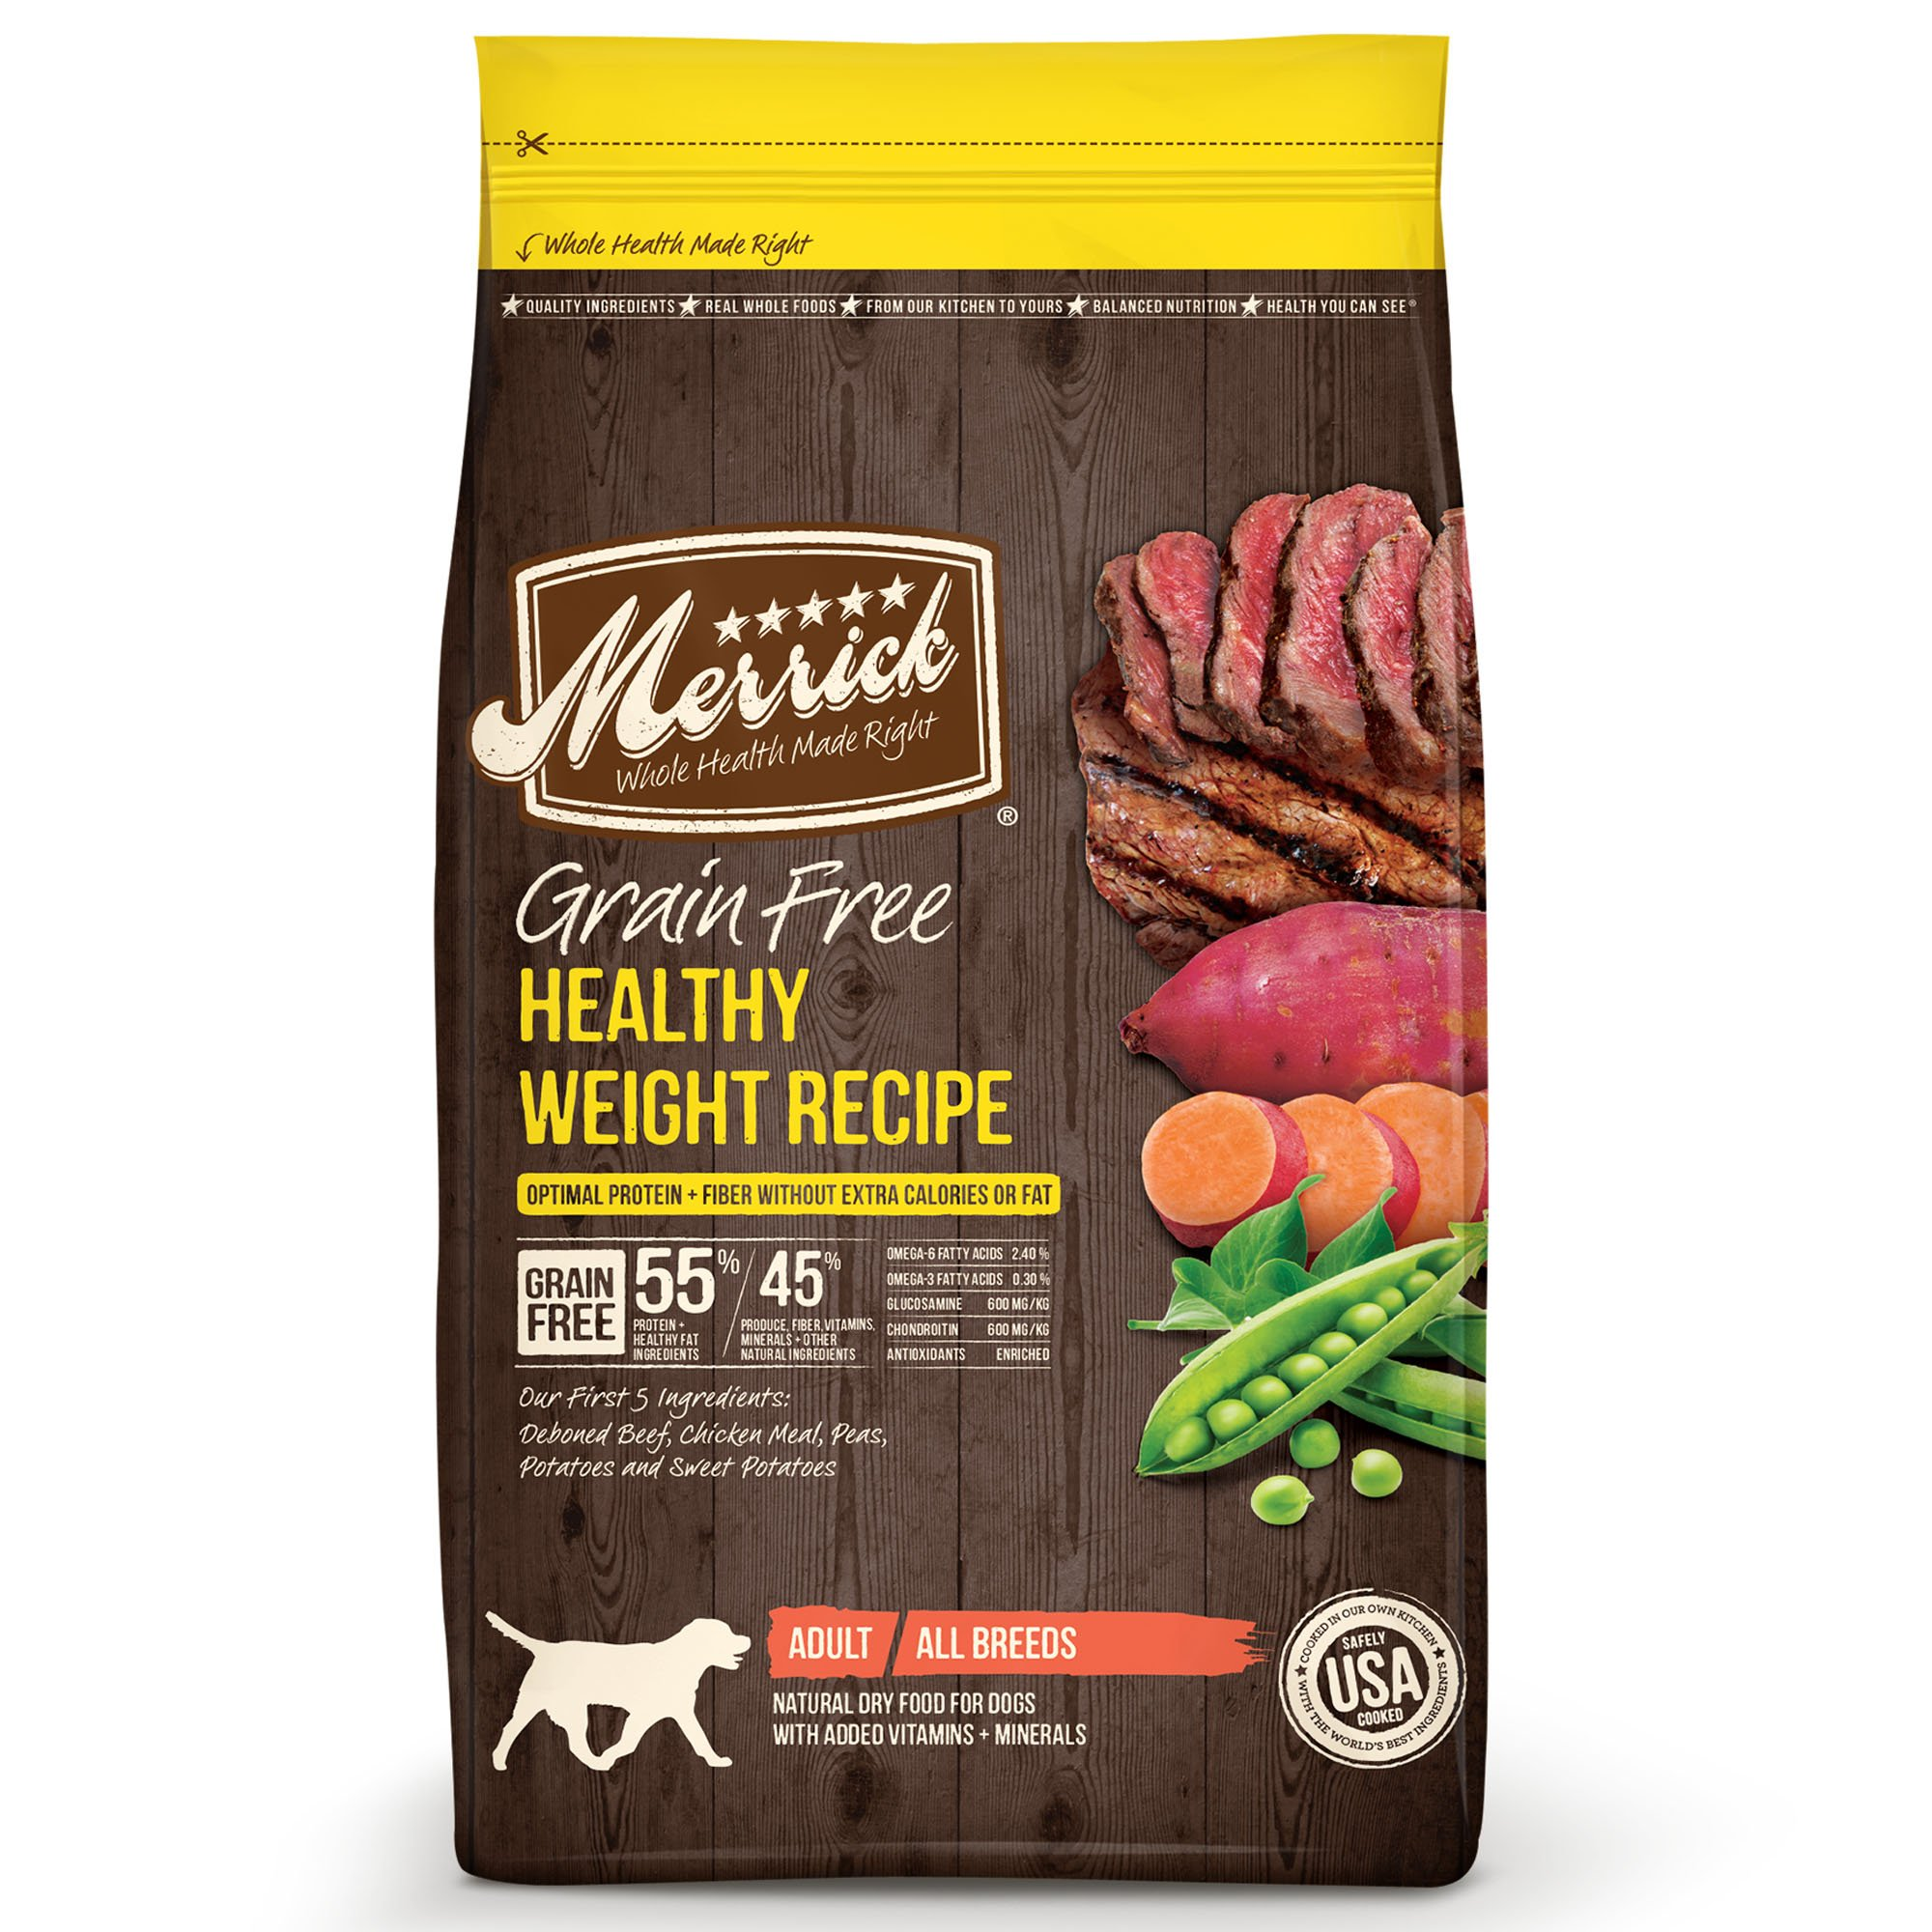 Merrick Grain Free Healthy Weight Recipe Dry Dog Food, 25 lbs.